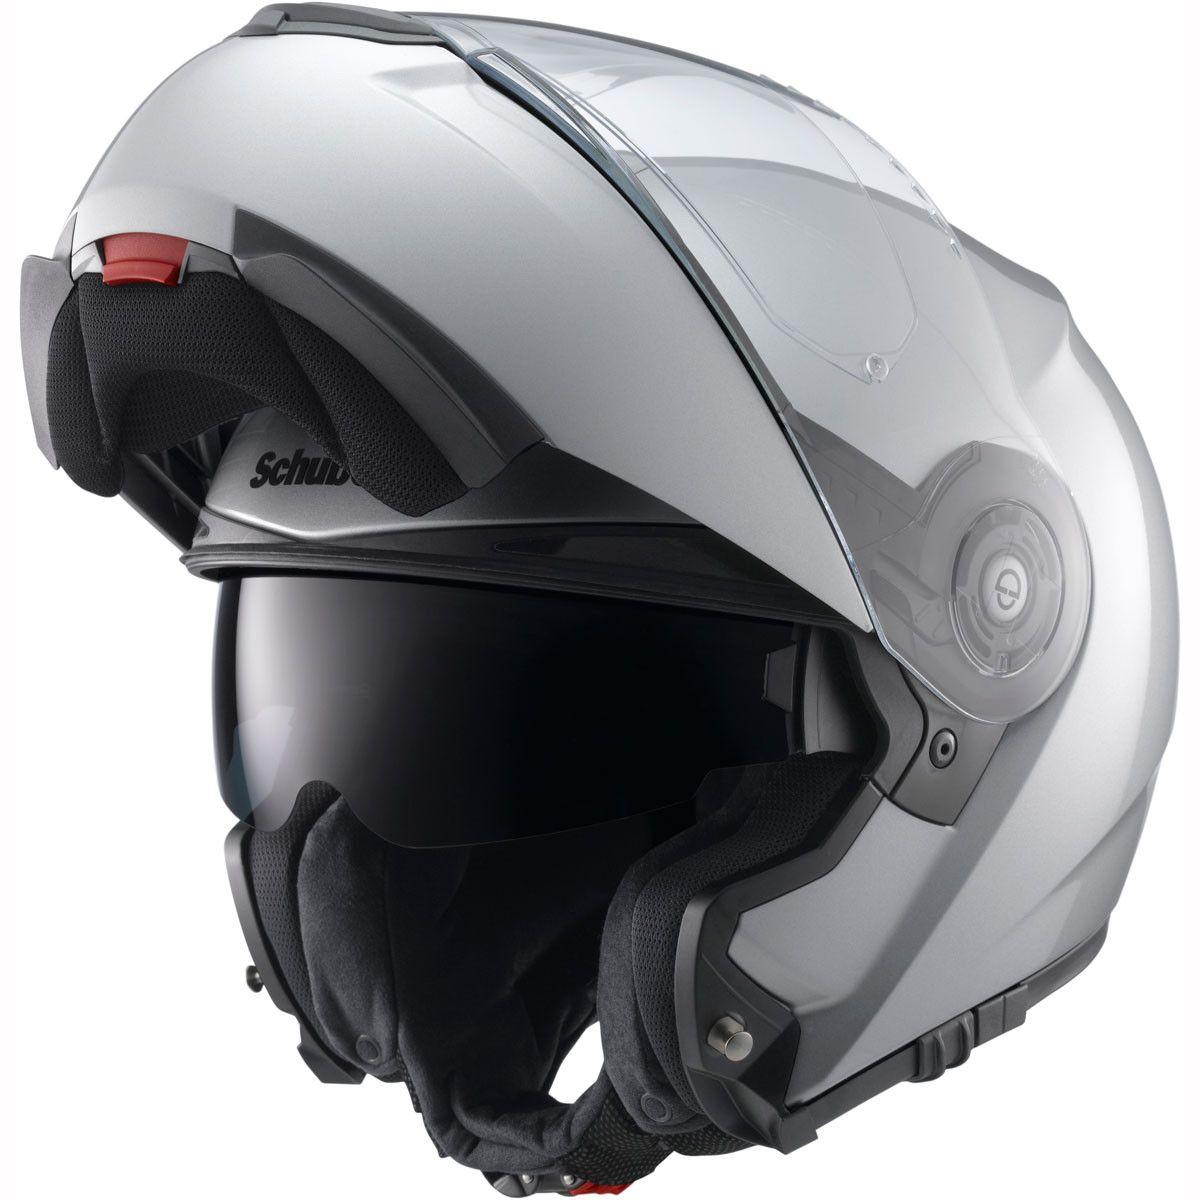 Schuberth C3 Pro Helmet in Silver The Schuberth C3 Pro